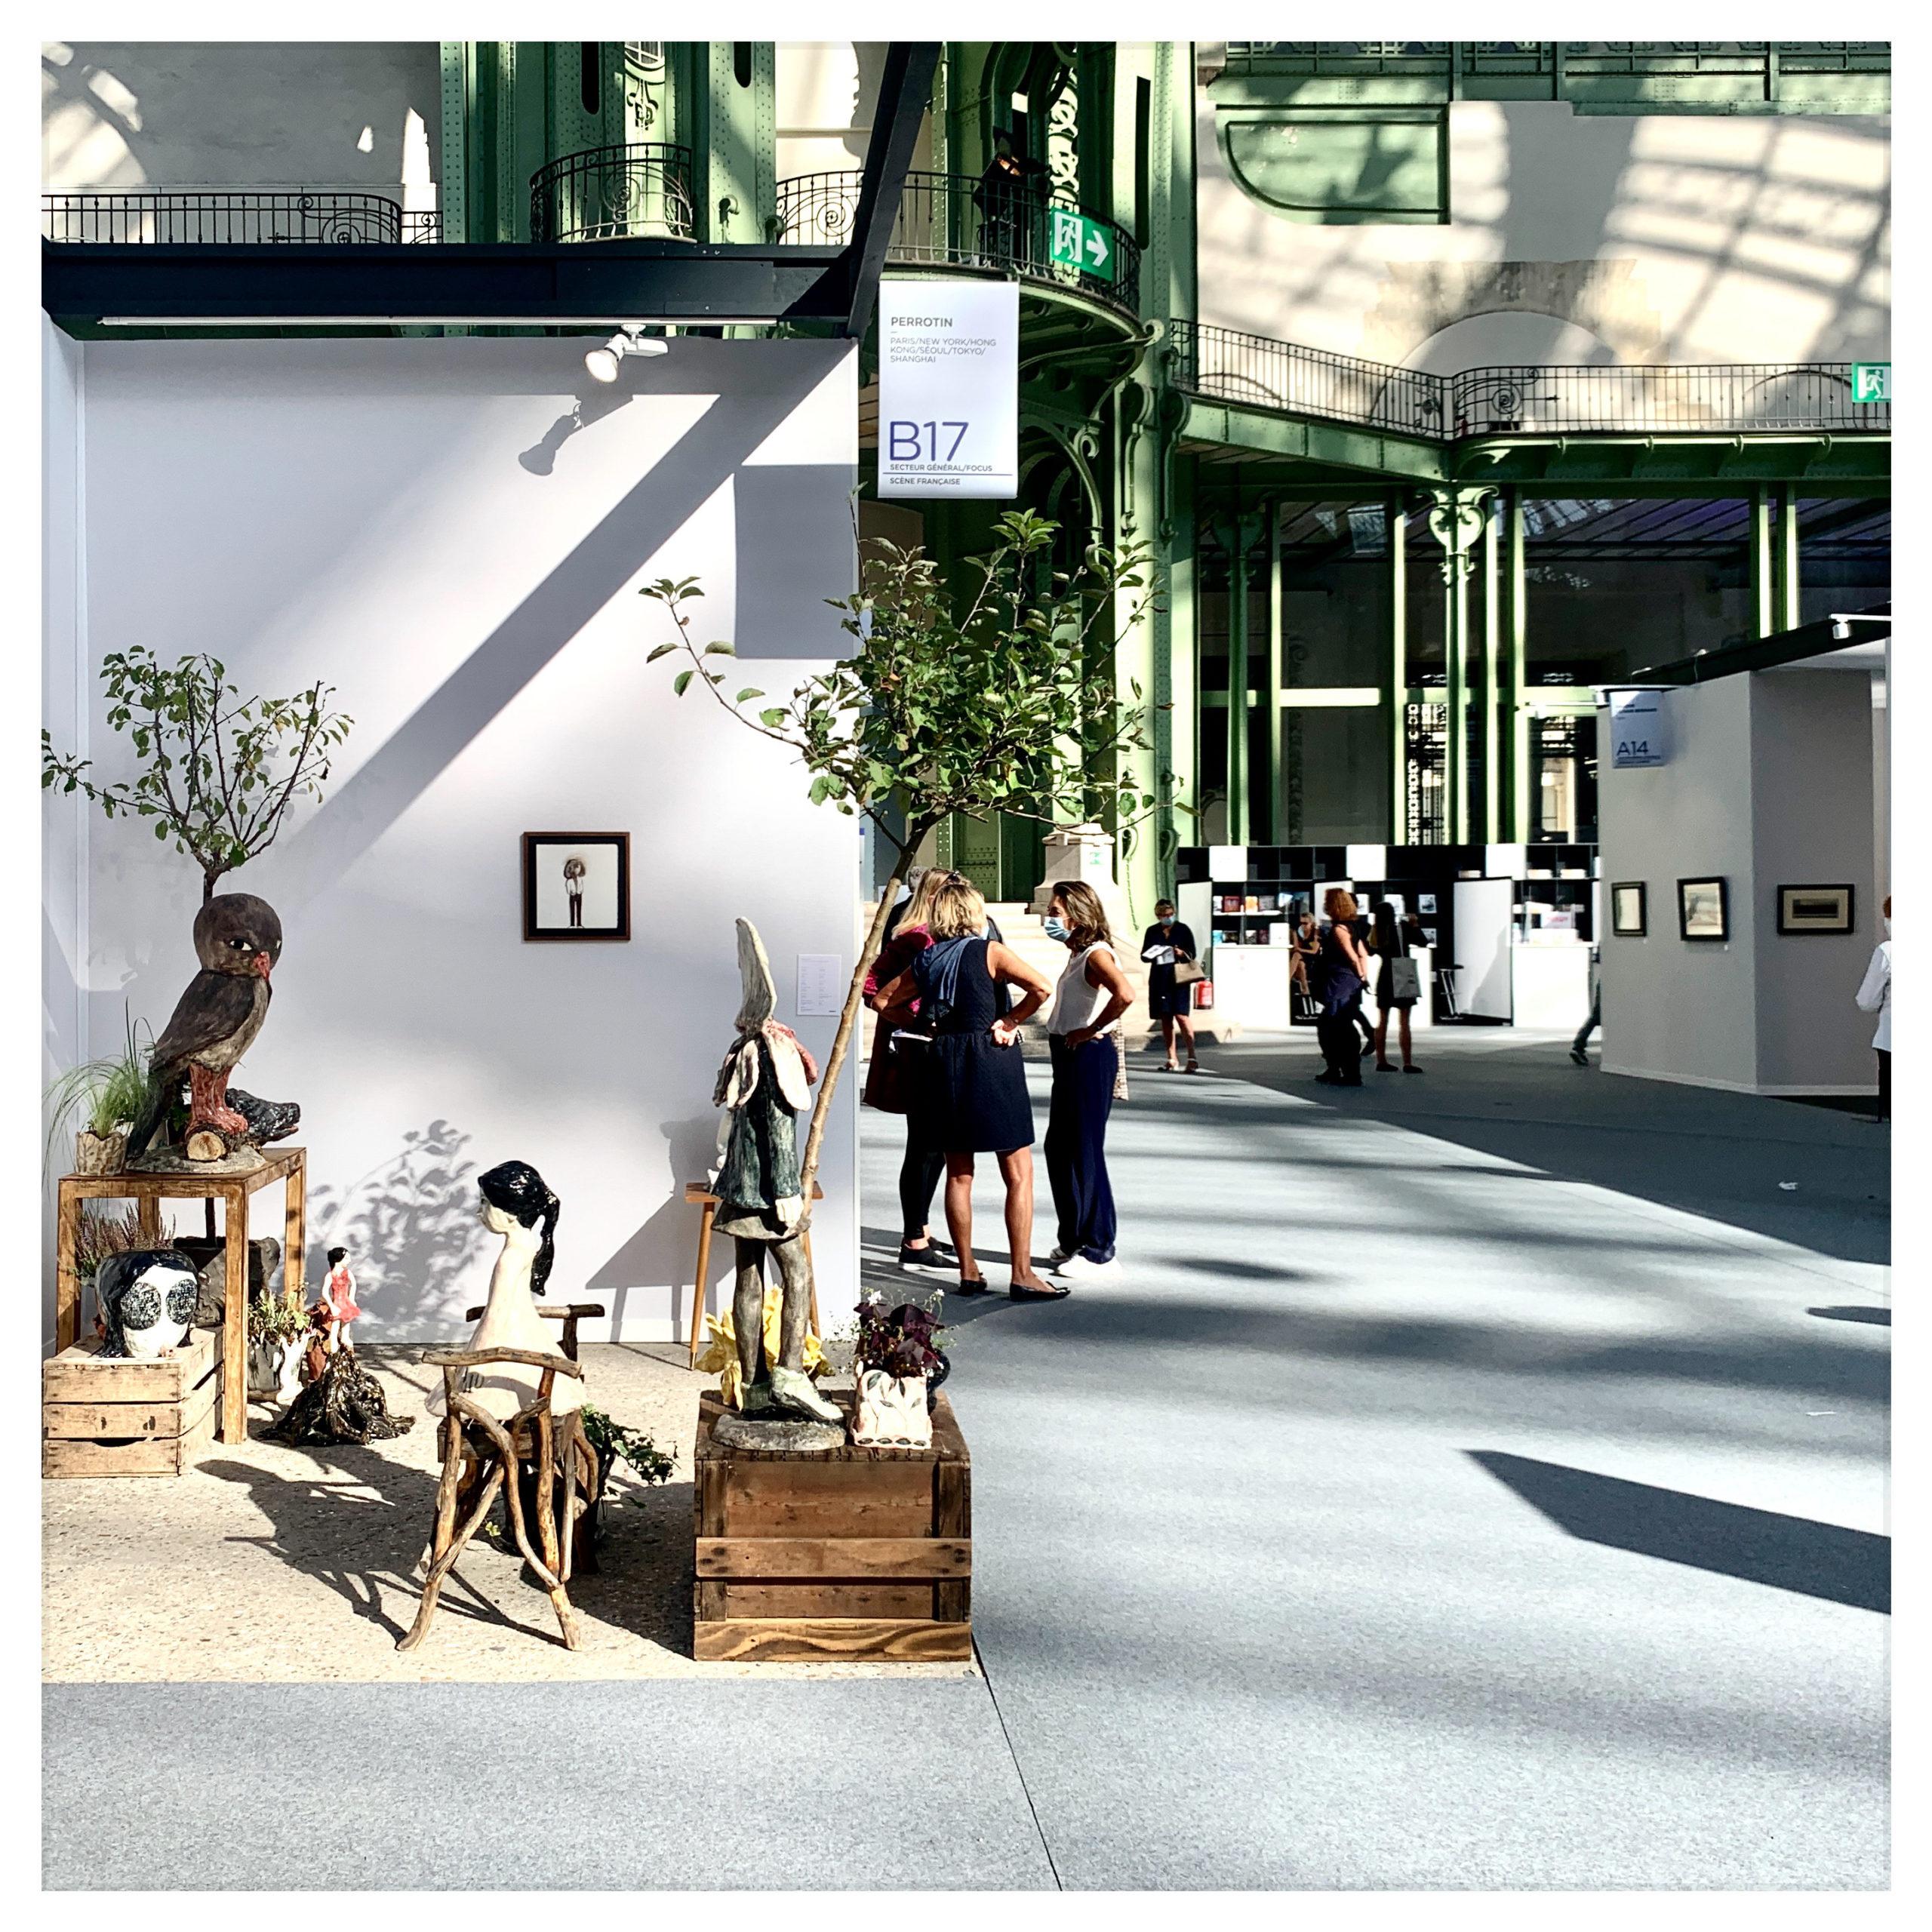 Vue du stand de la galerie Emmanuel Perrotin, ART PARIS 2020.